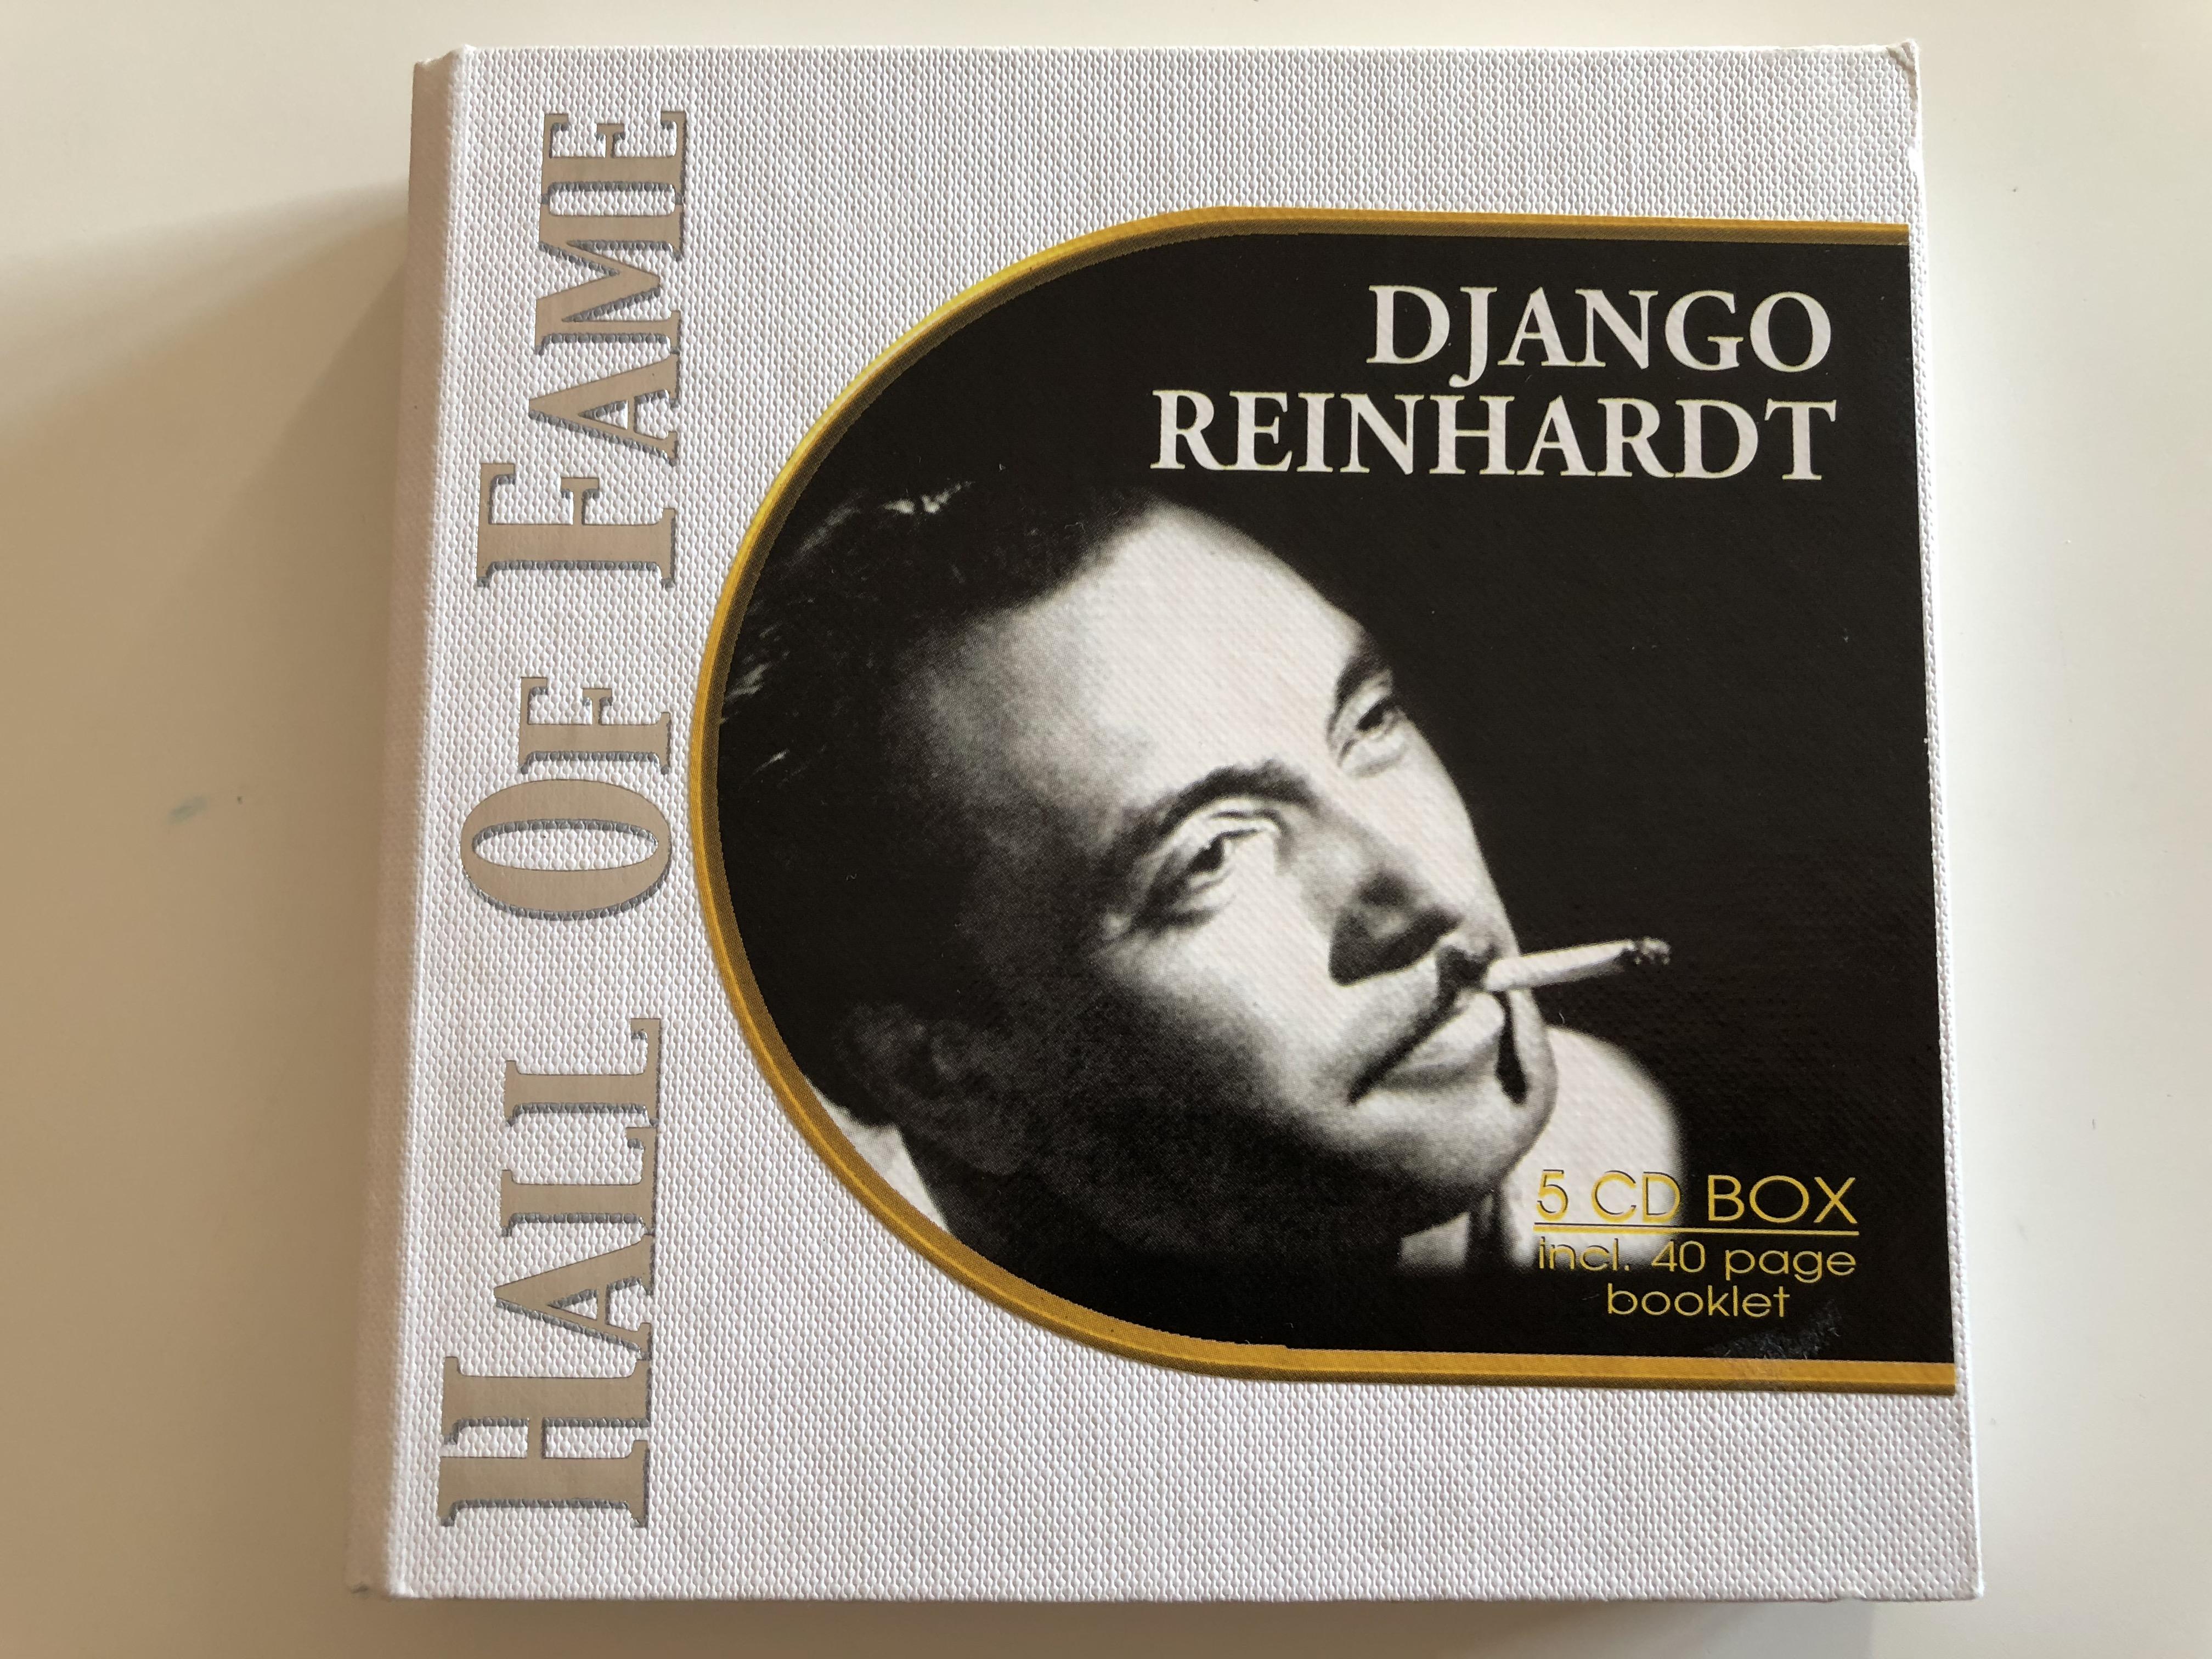 django-reinhardt-hall-of-fame-past-perfect-jazz-line-5x-audio-cd-2002-220167-1-.jpg